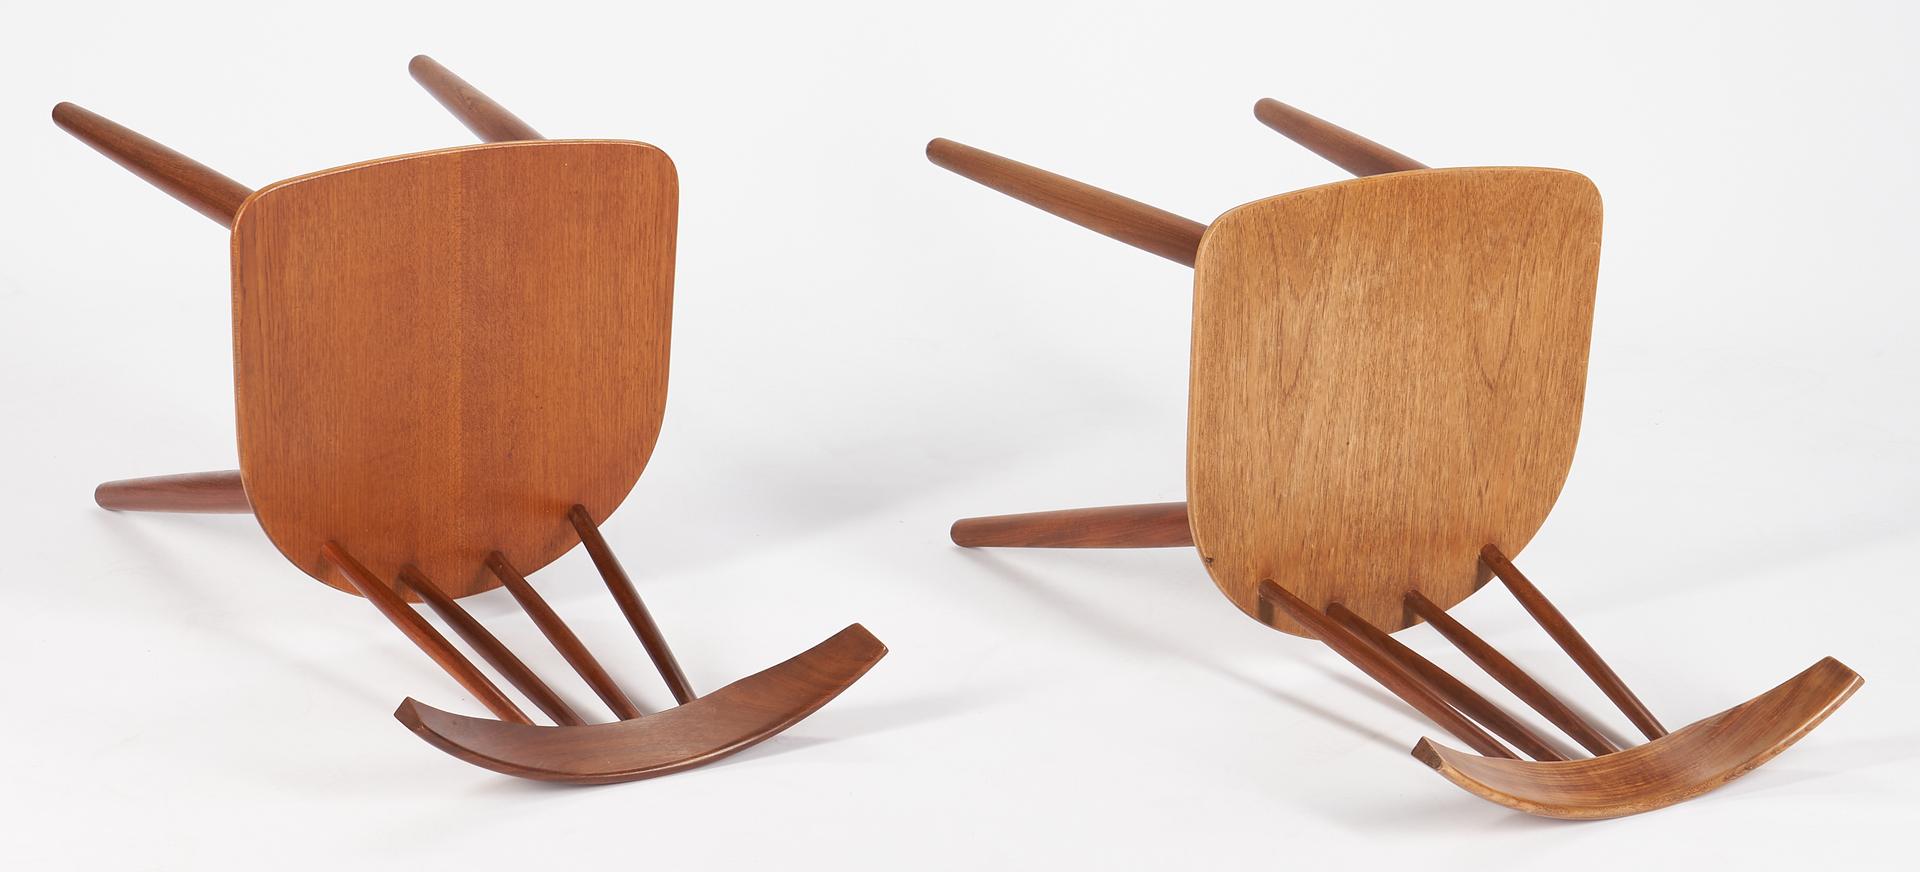 Lot 857: 8 Danish Modern Teak Chairs by Frem Rojle